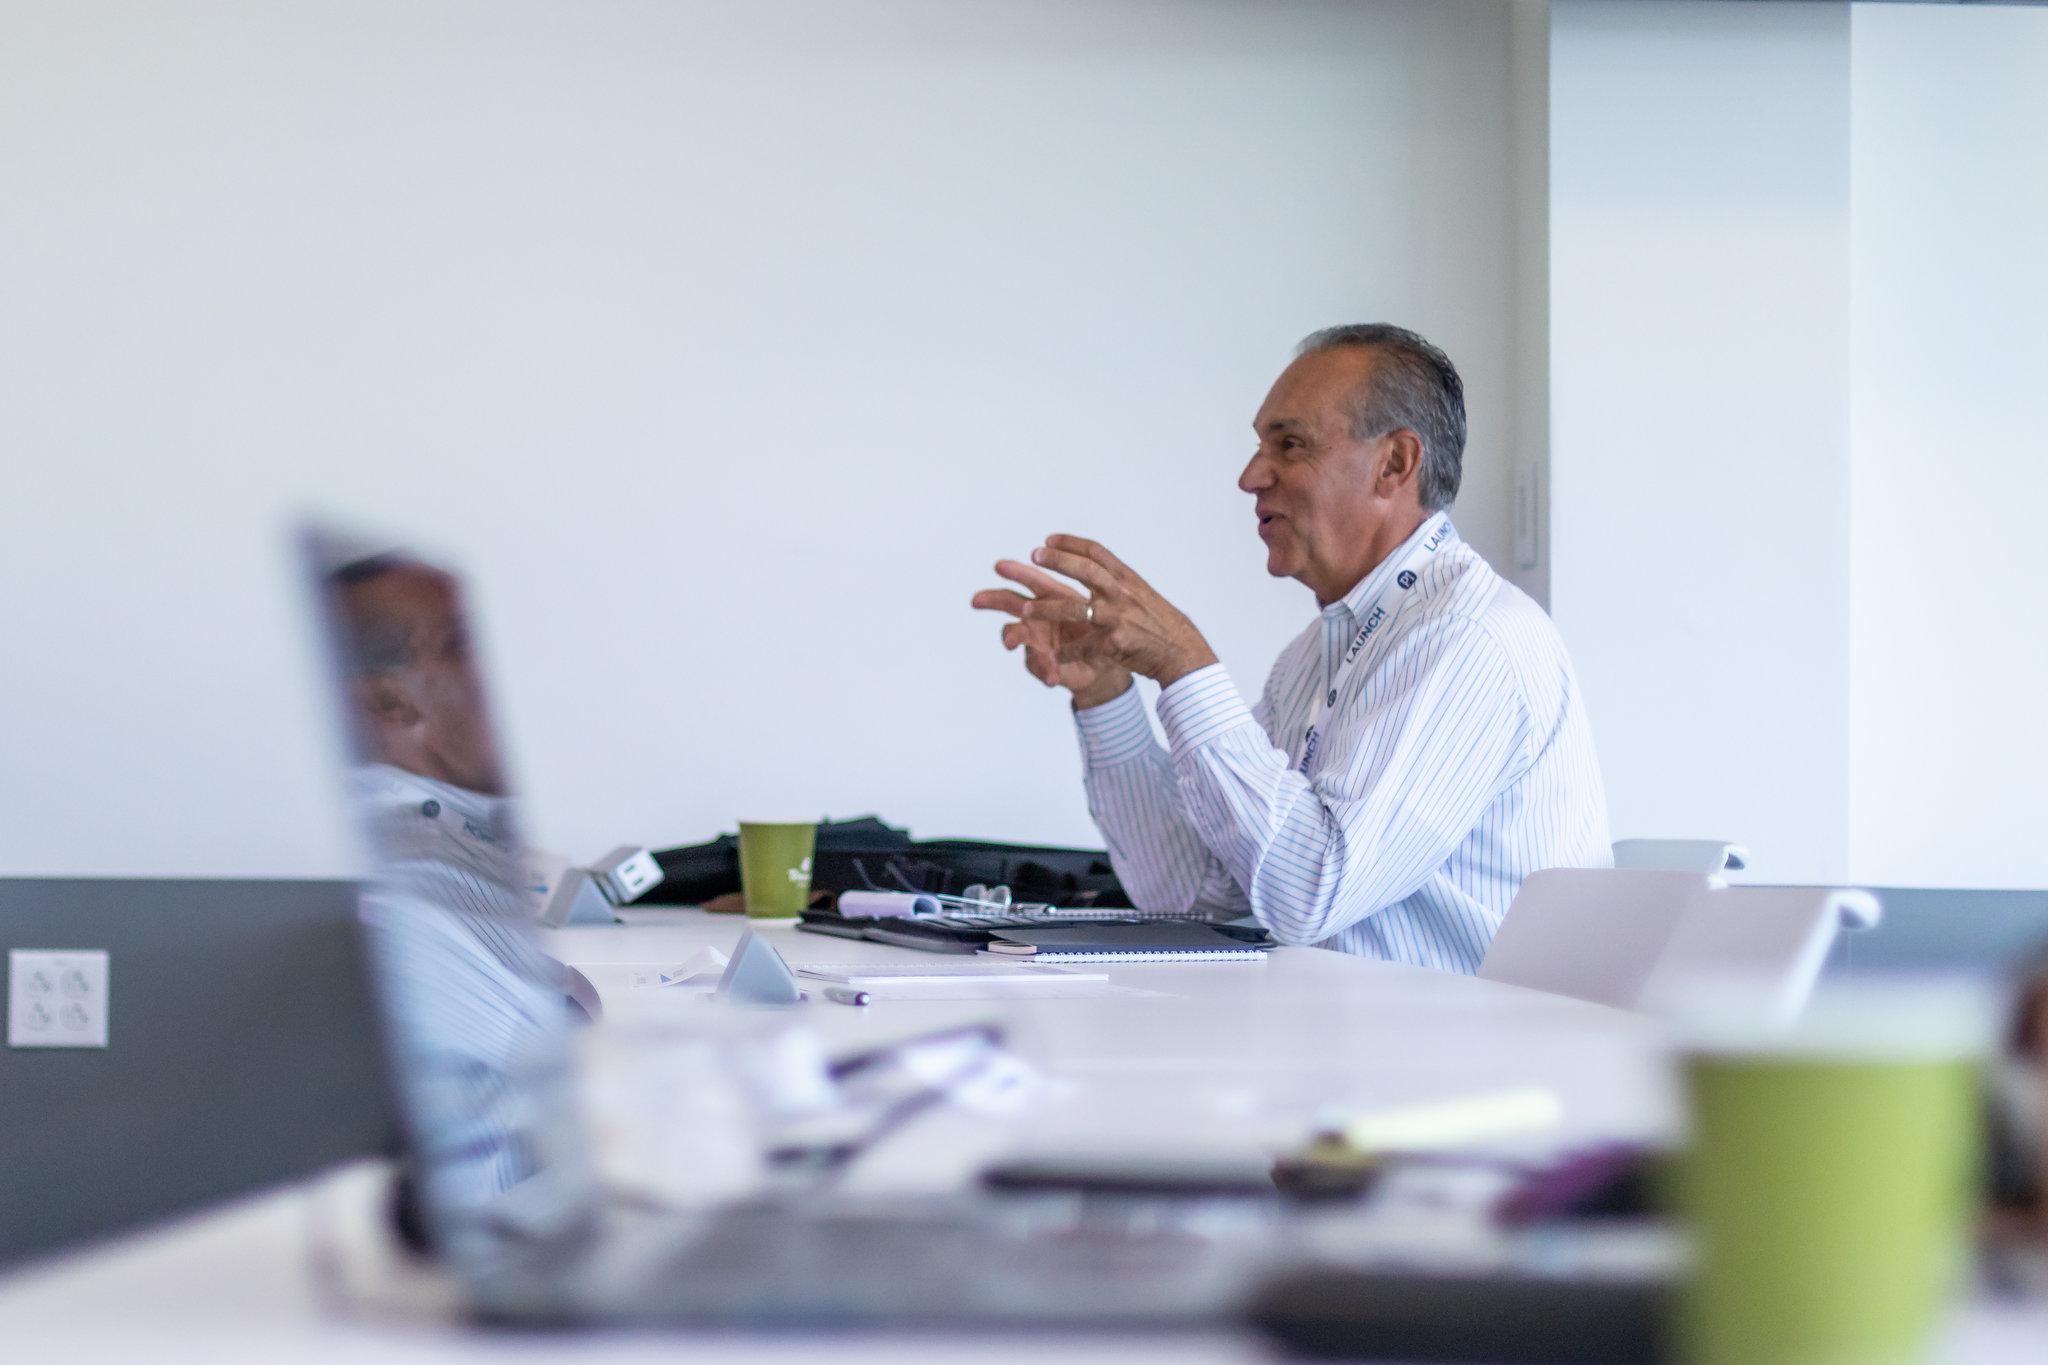 Manager in Predictive Index workshop